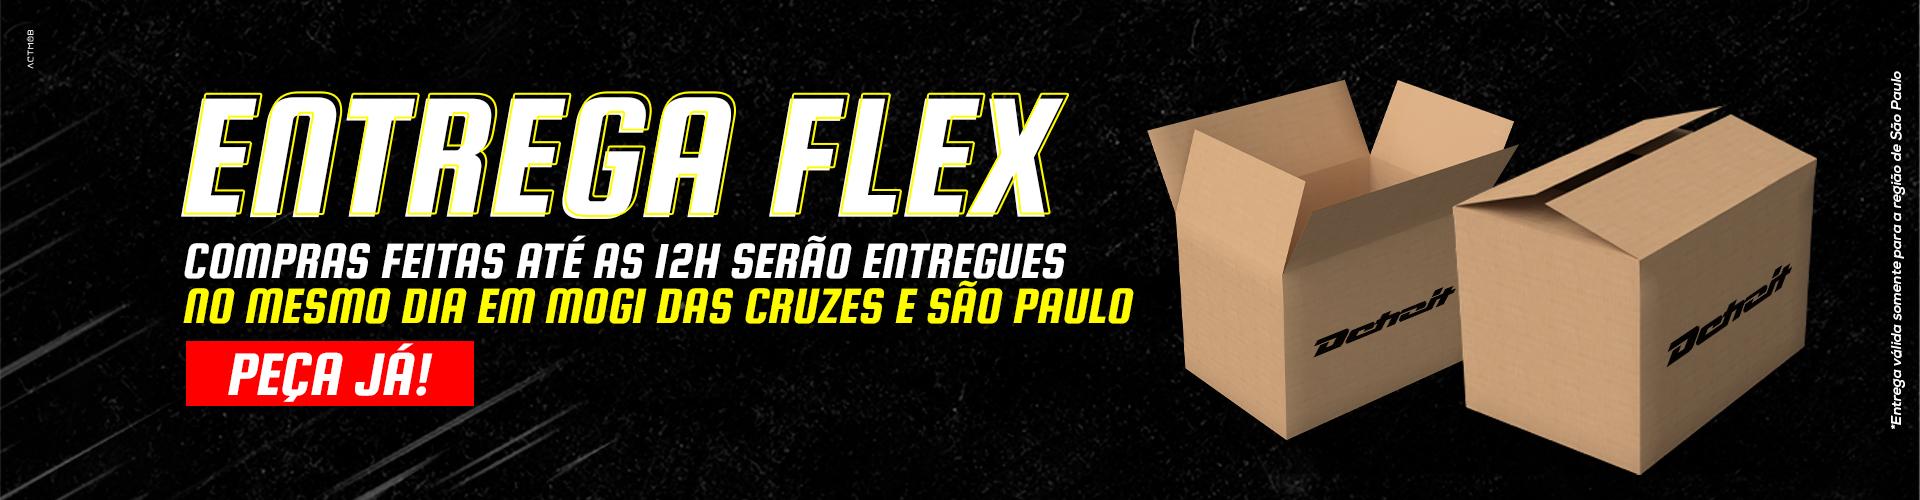 Entregaflex